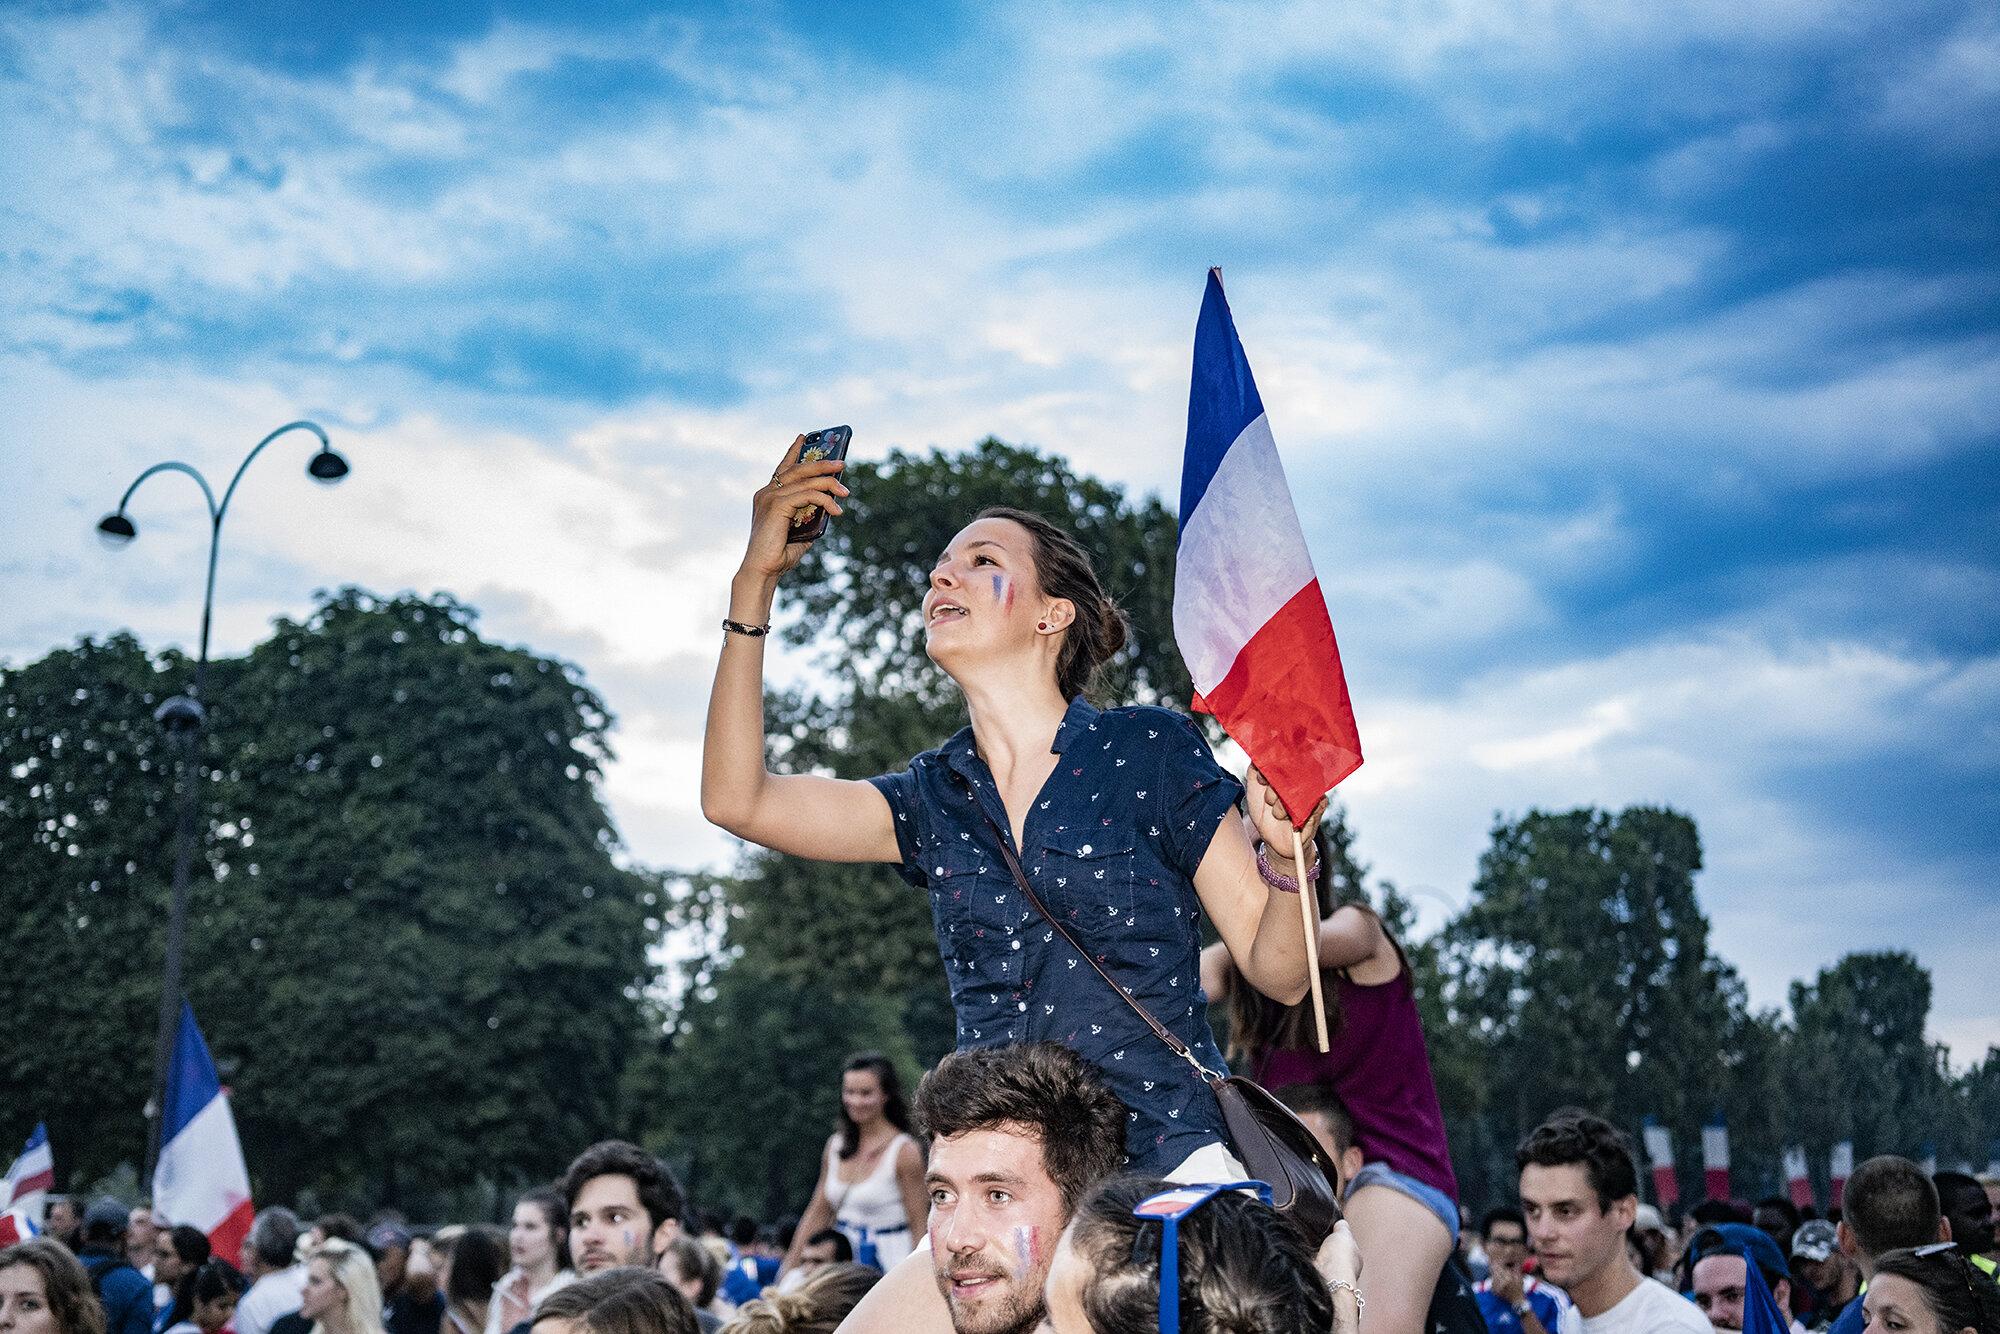 Paris_World_Cup_Celebration_2018-629.jpg